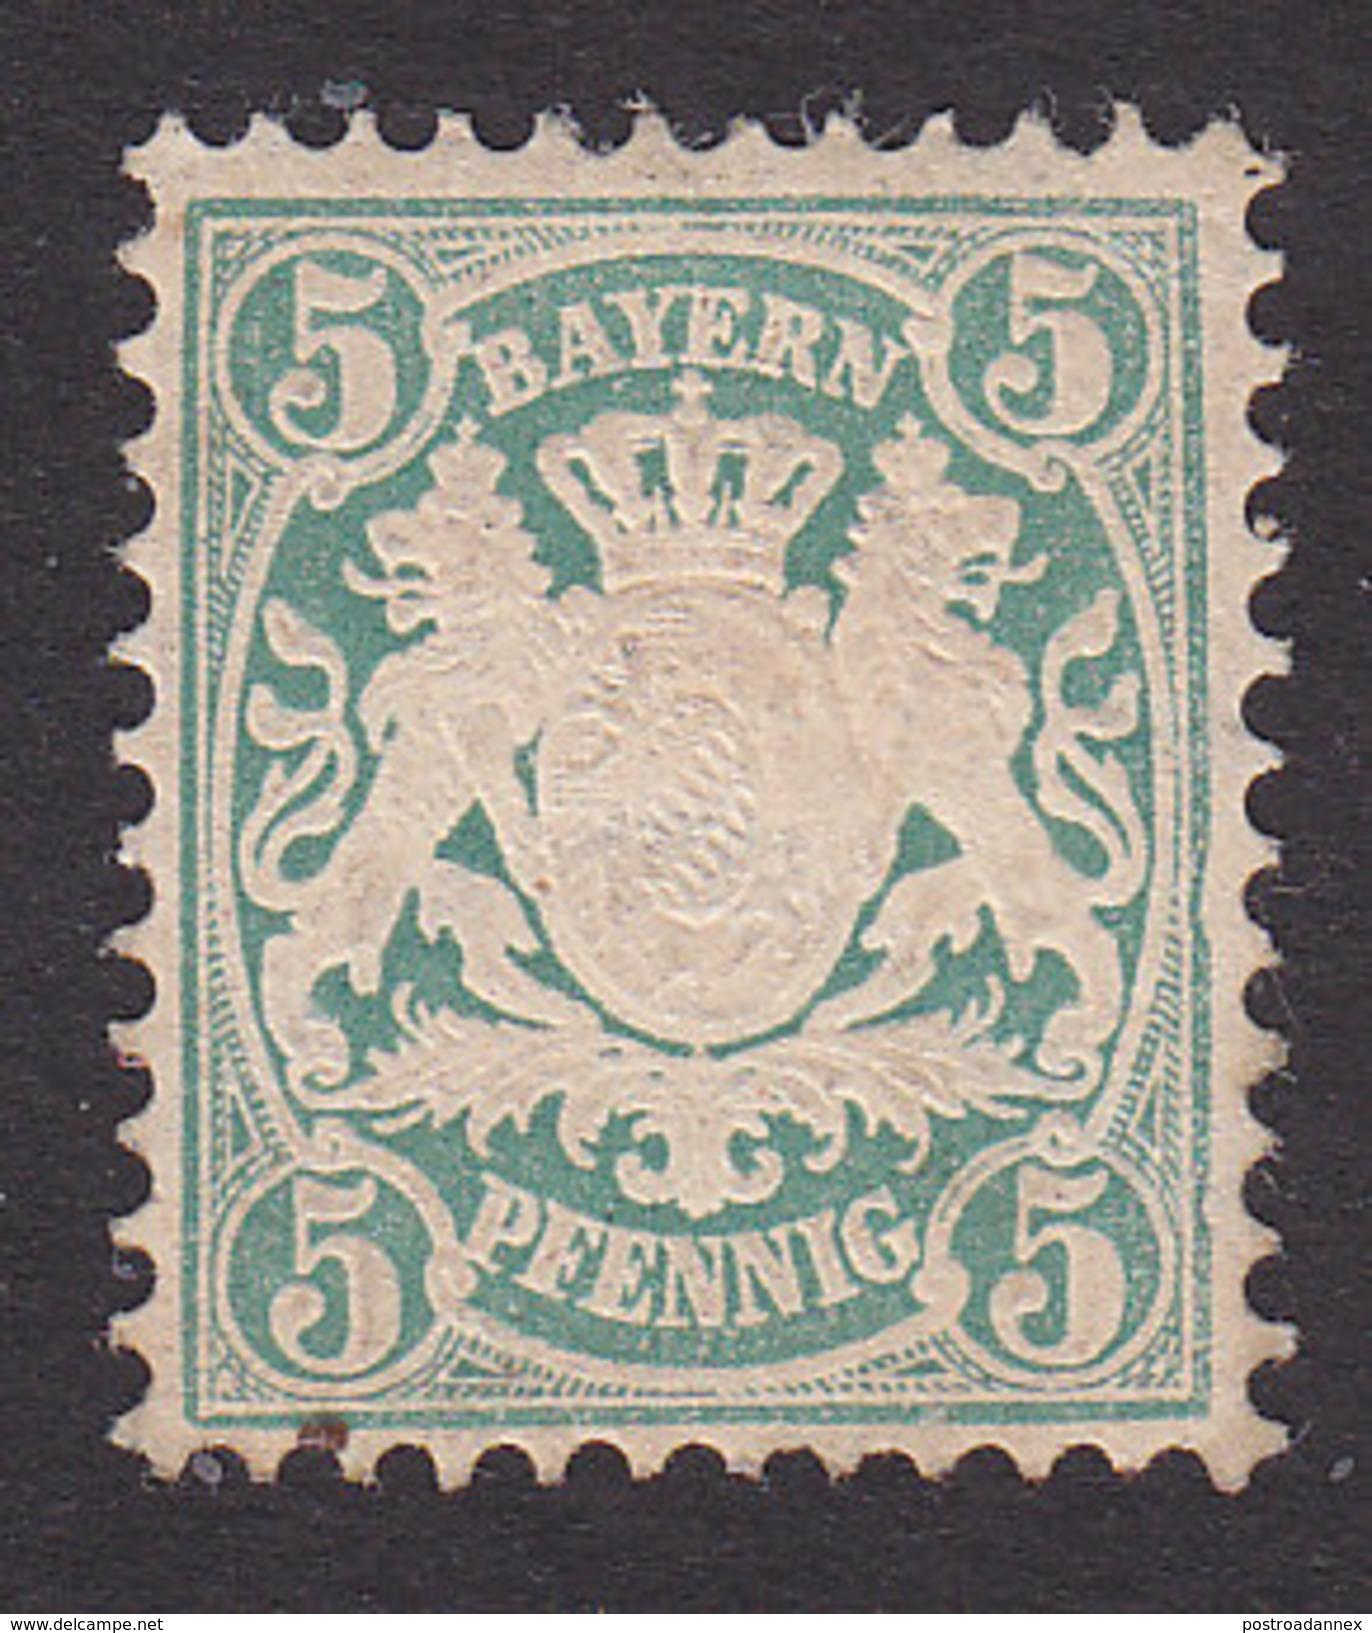 Bavaria, Scott #39, Mint Hinged, Coat Of Arms, Issued 1876 - Bavaria